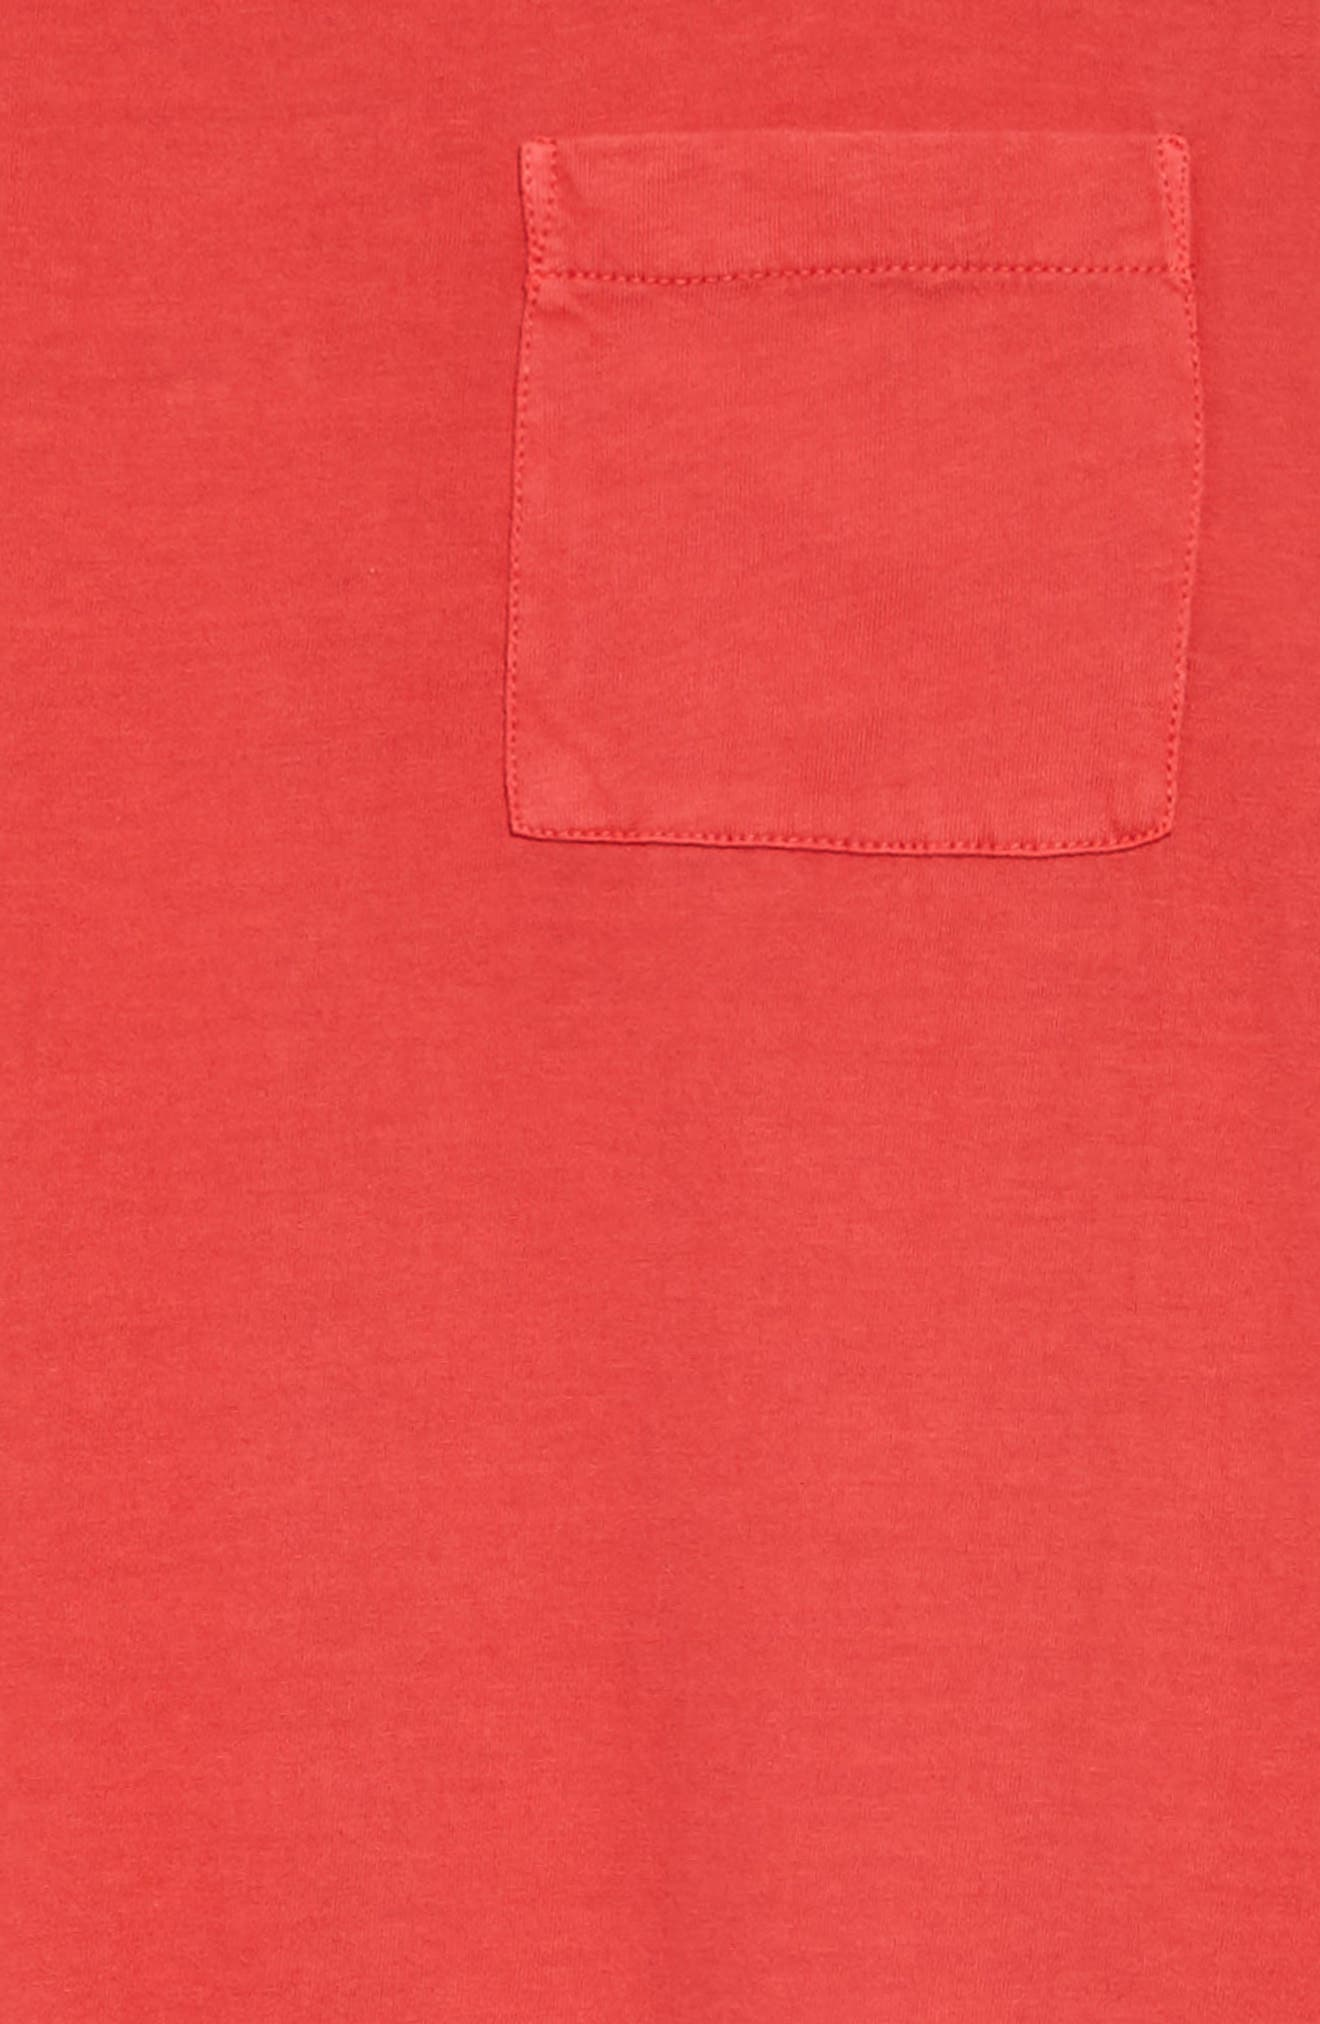 Washed T-Shirt Dress,                             Alternate thumbnail 3, color,                             Red Sage